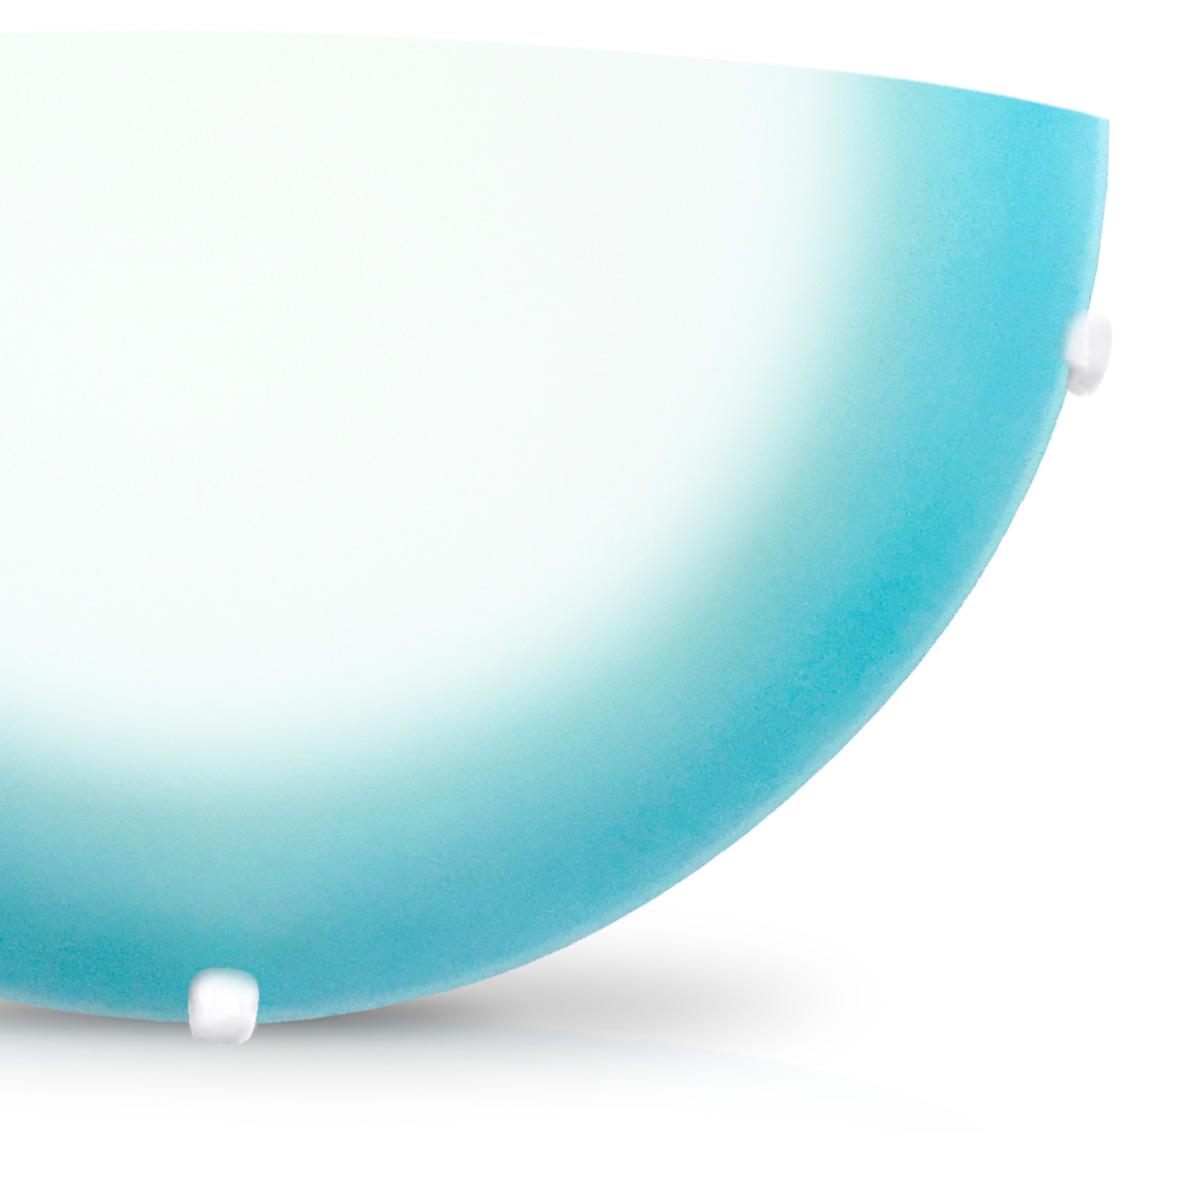 Arandela Pop 30cm 1 Lampada E-27 Max 60w Vidro Azul